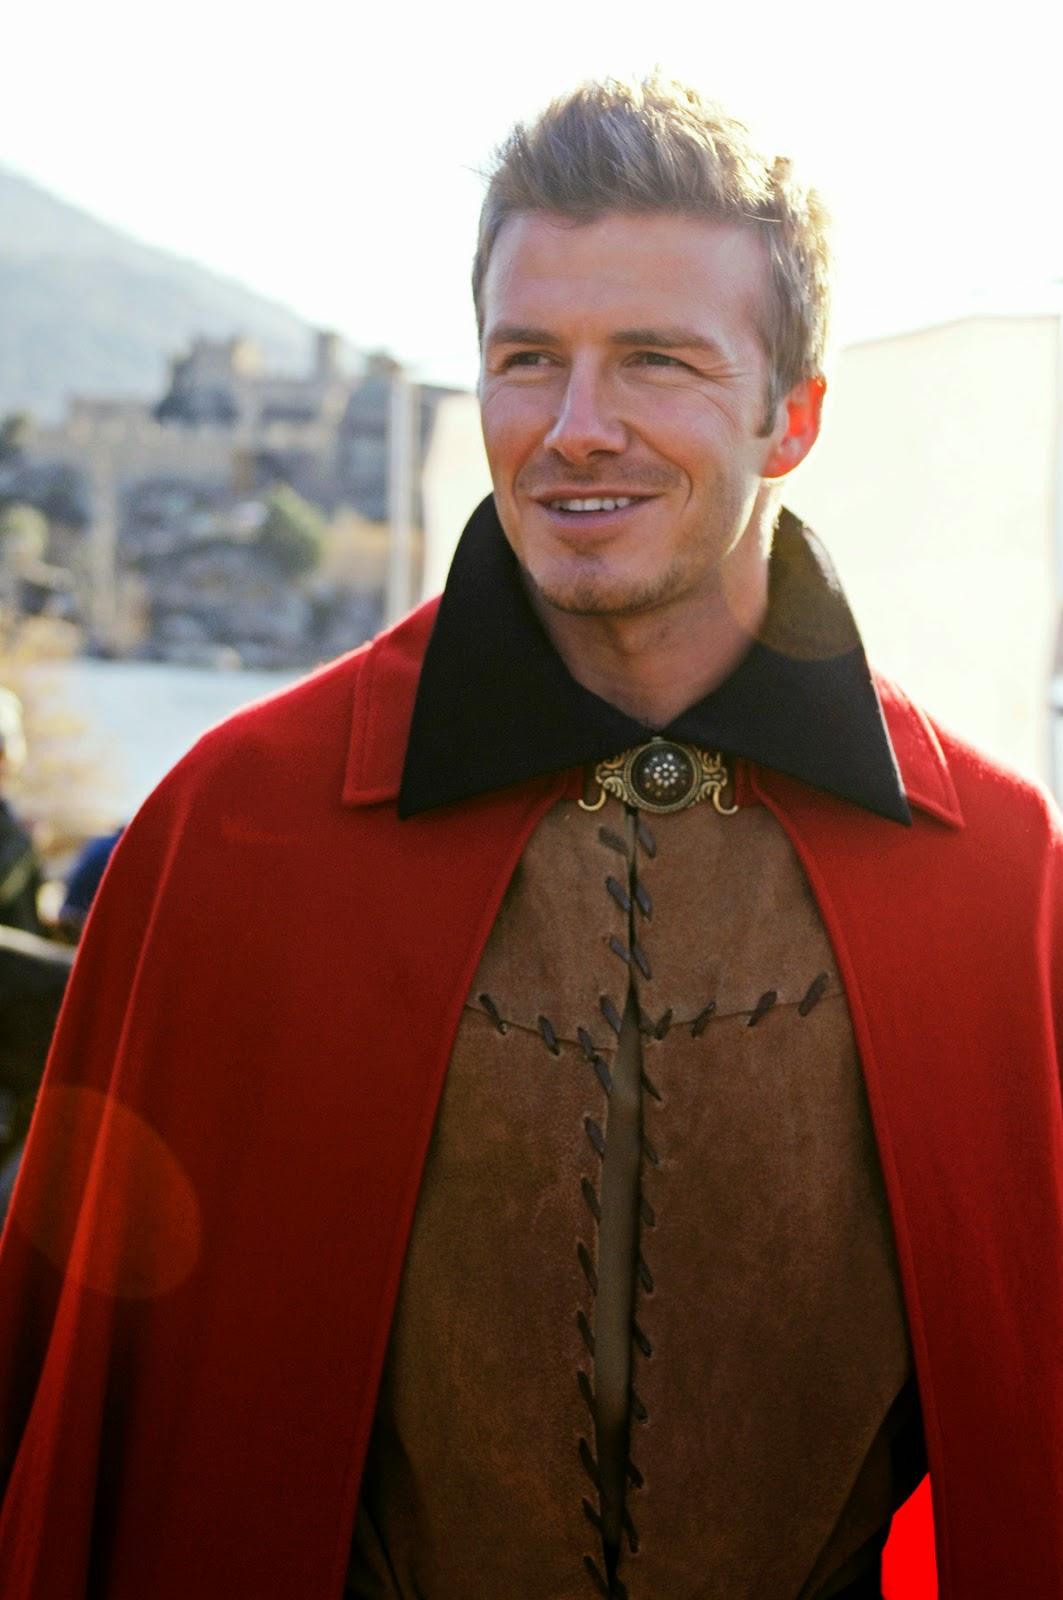 David Beckham Prince Philip Disney Sleeping Beauty animatedfilmreviews.filminspector.com